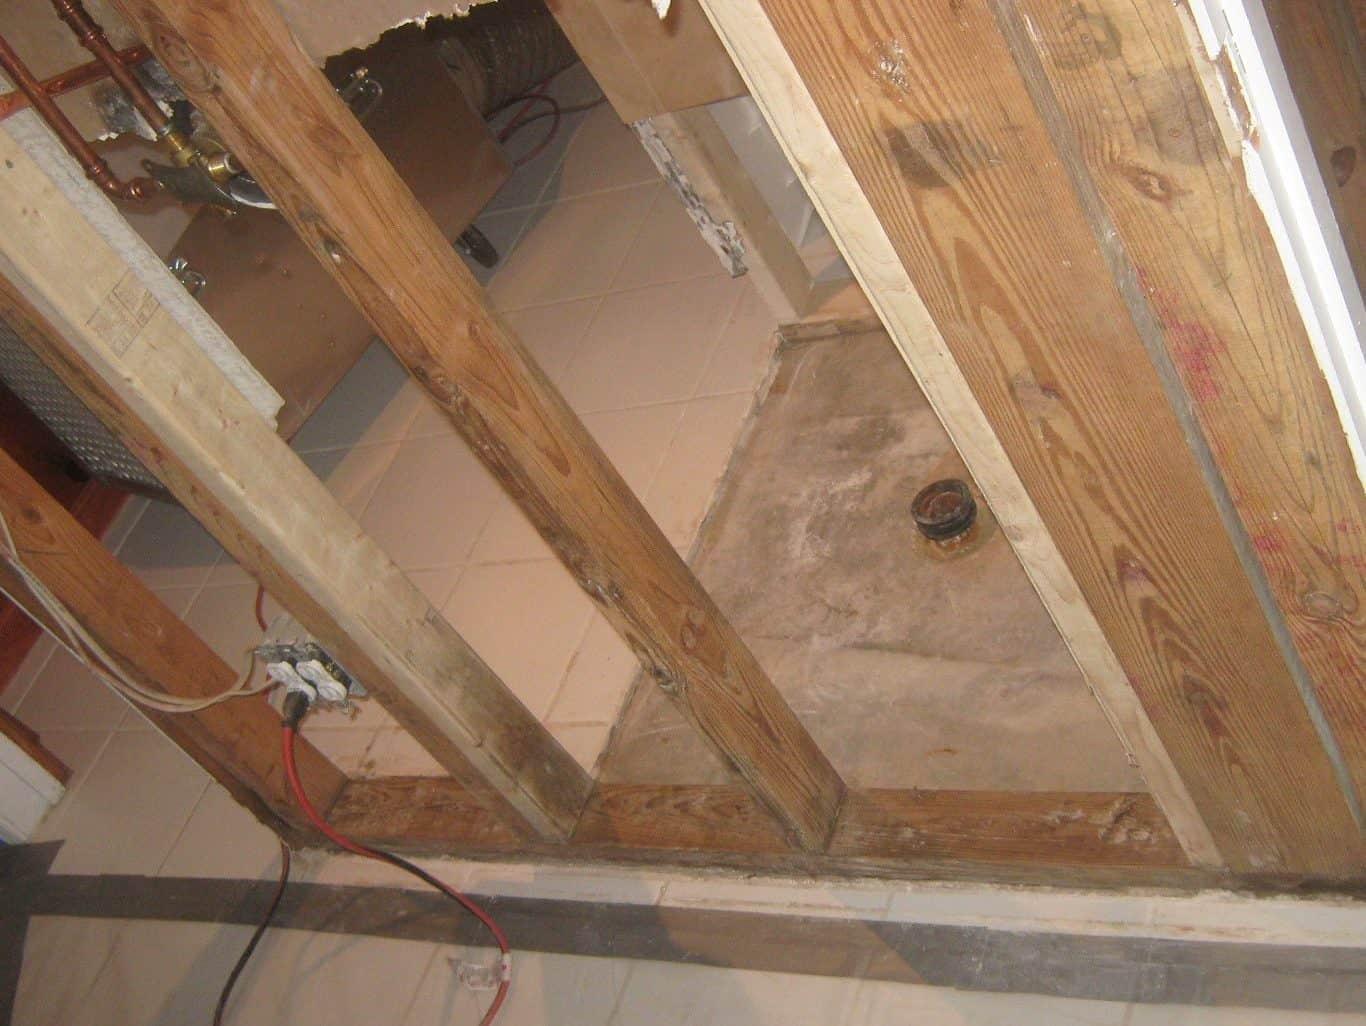 7. Valor Mold Removal - Mold Remediation In Basement- Arlington VA (After)